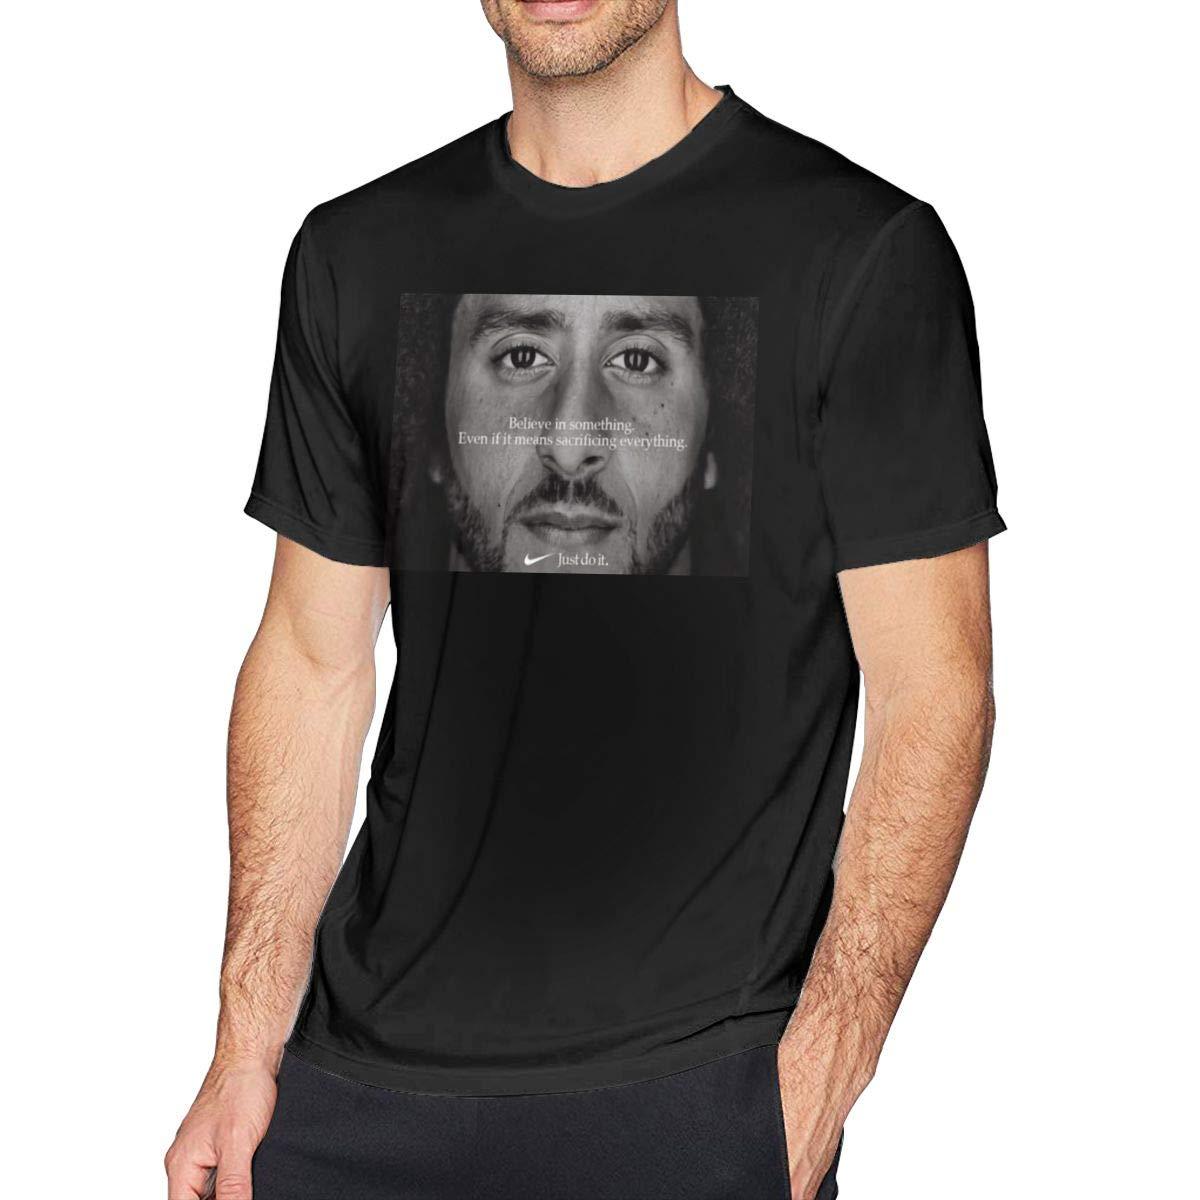 Xunikolemorris 5 Colin Kaepernick Just Do It Man's Tshirts 5 Black